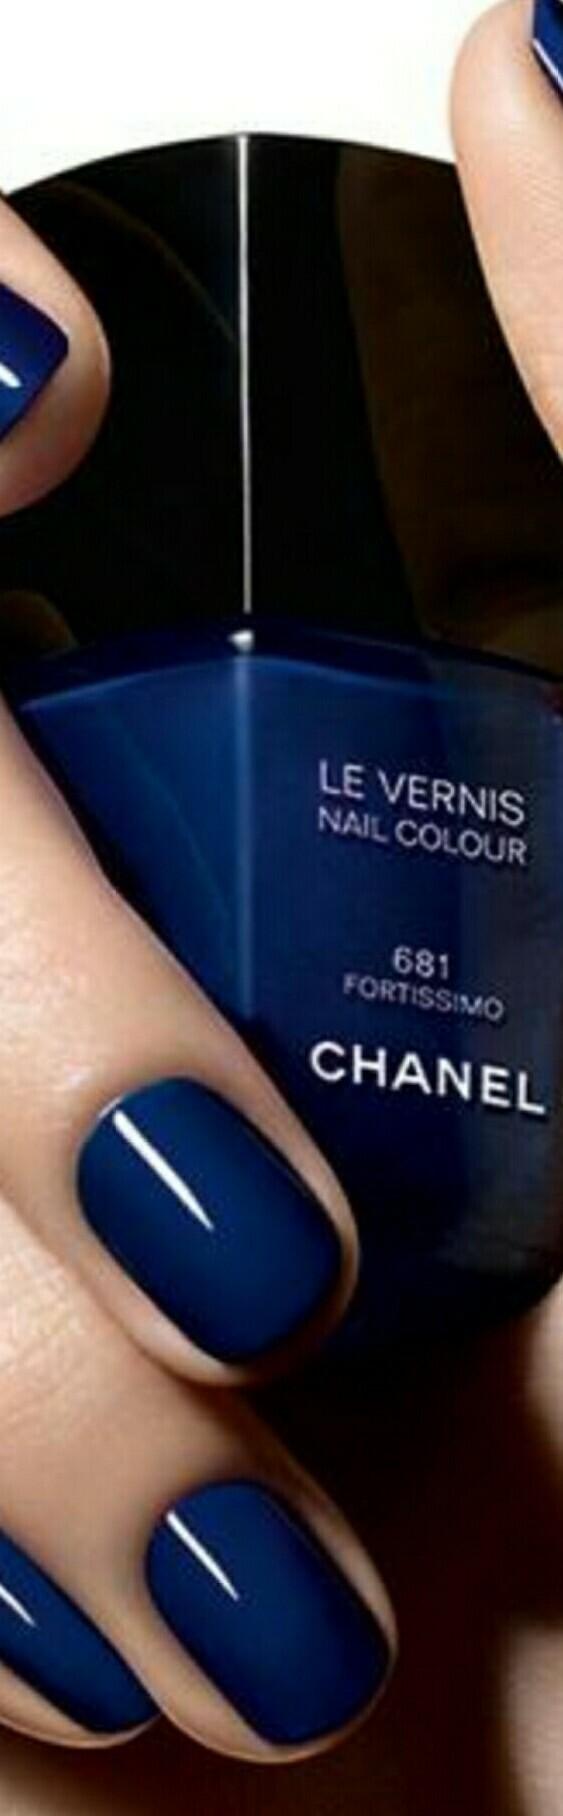 Pin de Cheryl smyth 2 en <Blue Forever> | Pinterest | Esmalte, Uñas ...